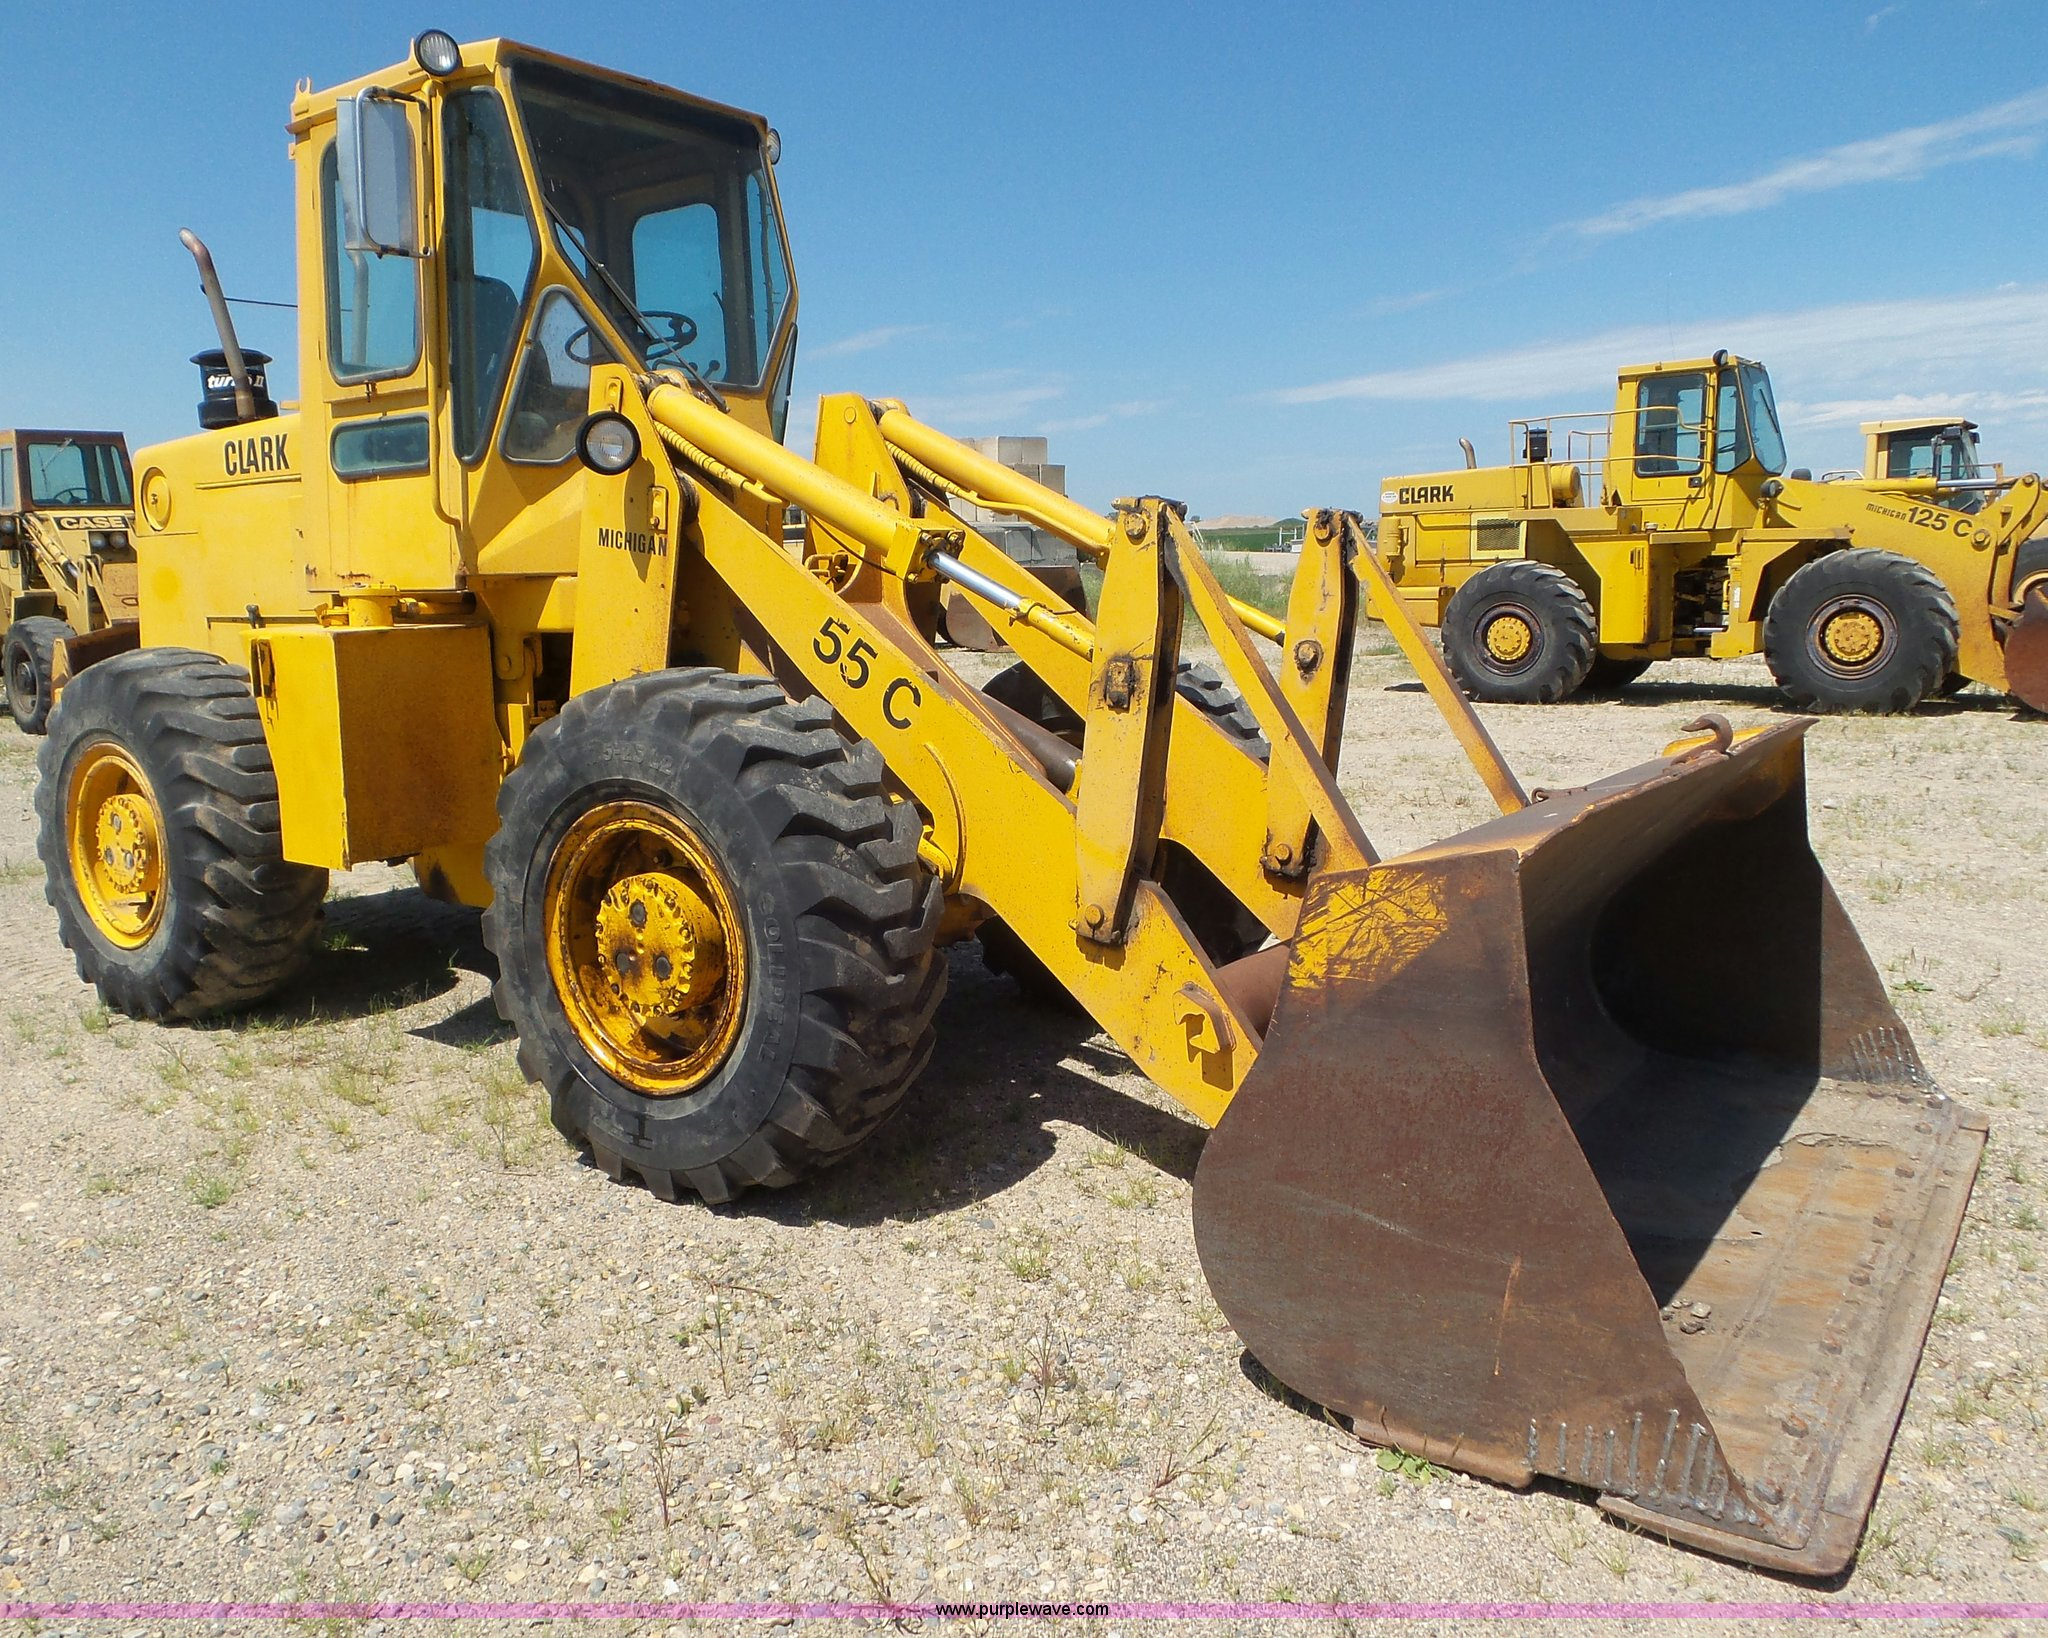 1981 clark 55c cu wheel loader in bellingham mn item l6834 sold purple wave 1981 clark 55c cu wheel loader in